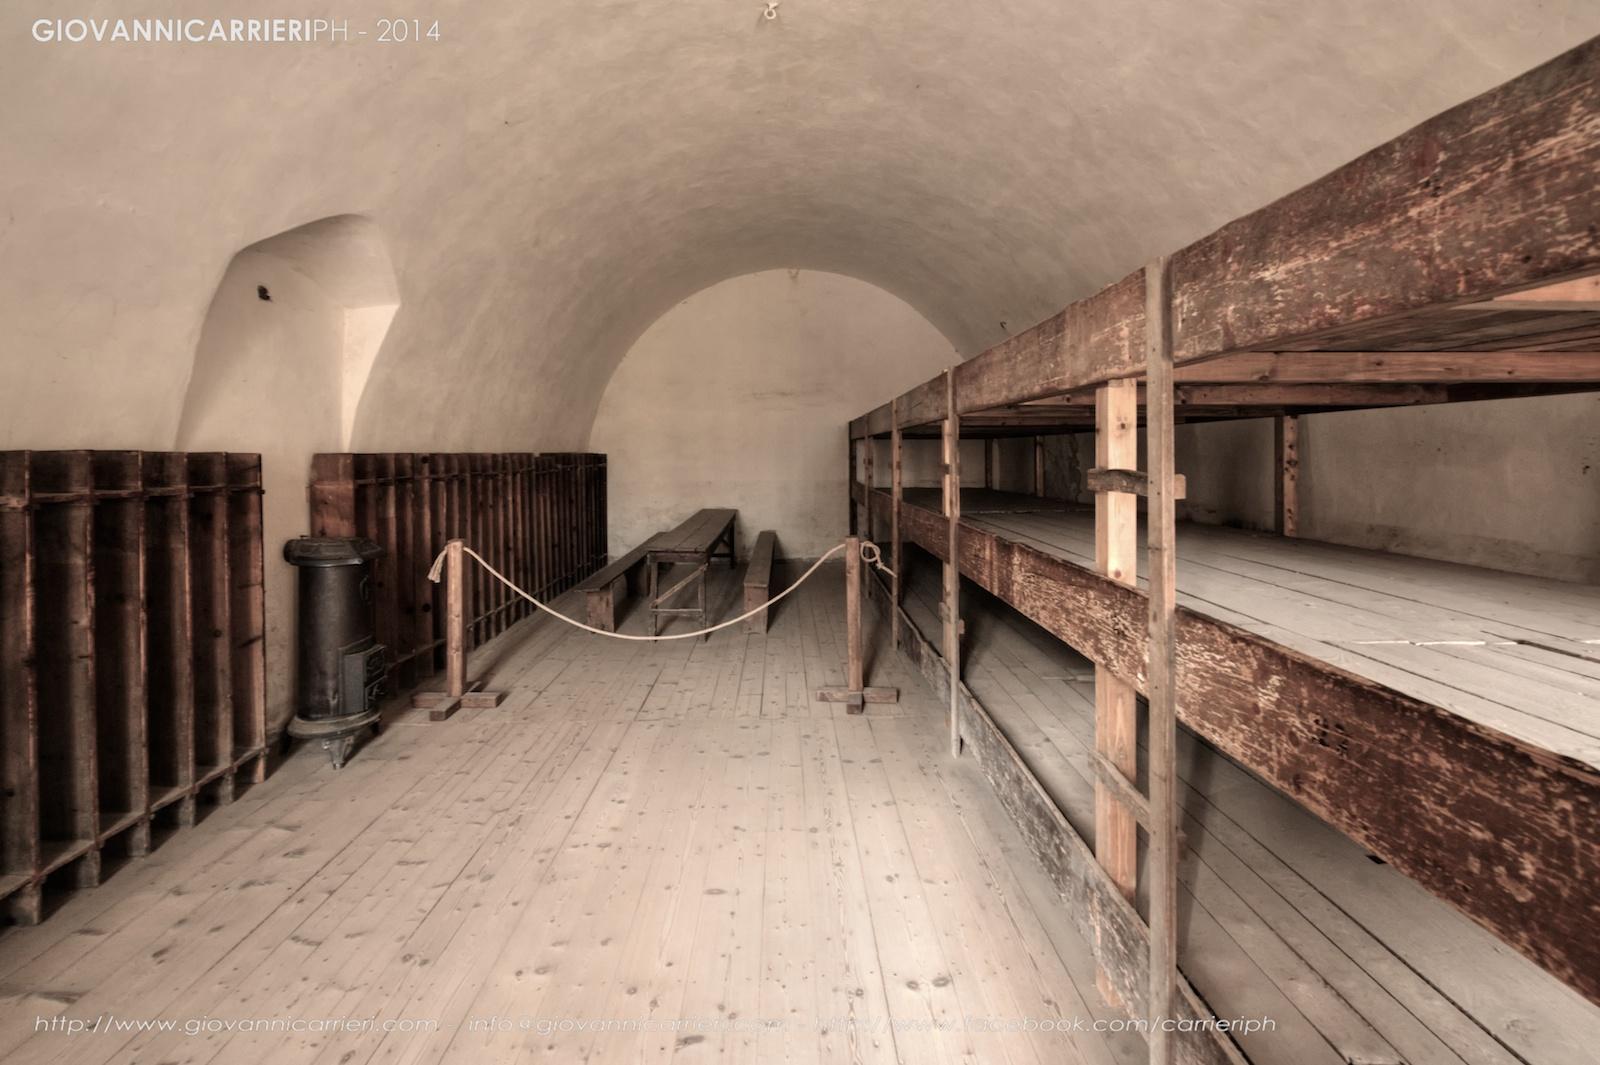 Celle comuni - Theresienstadt